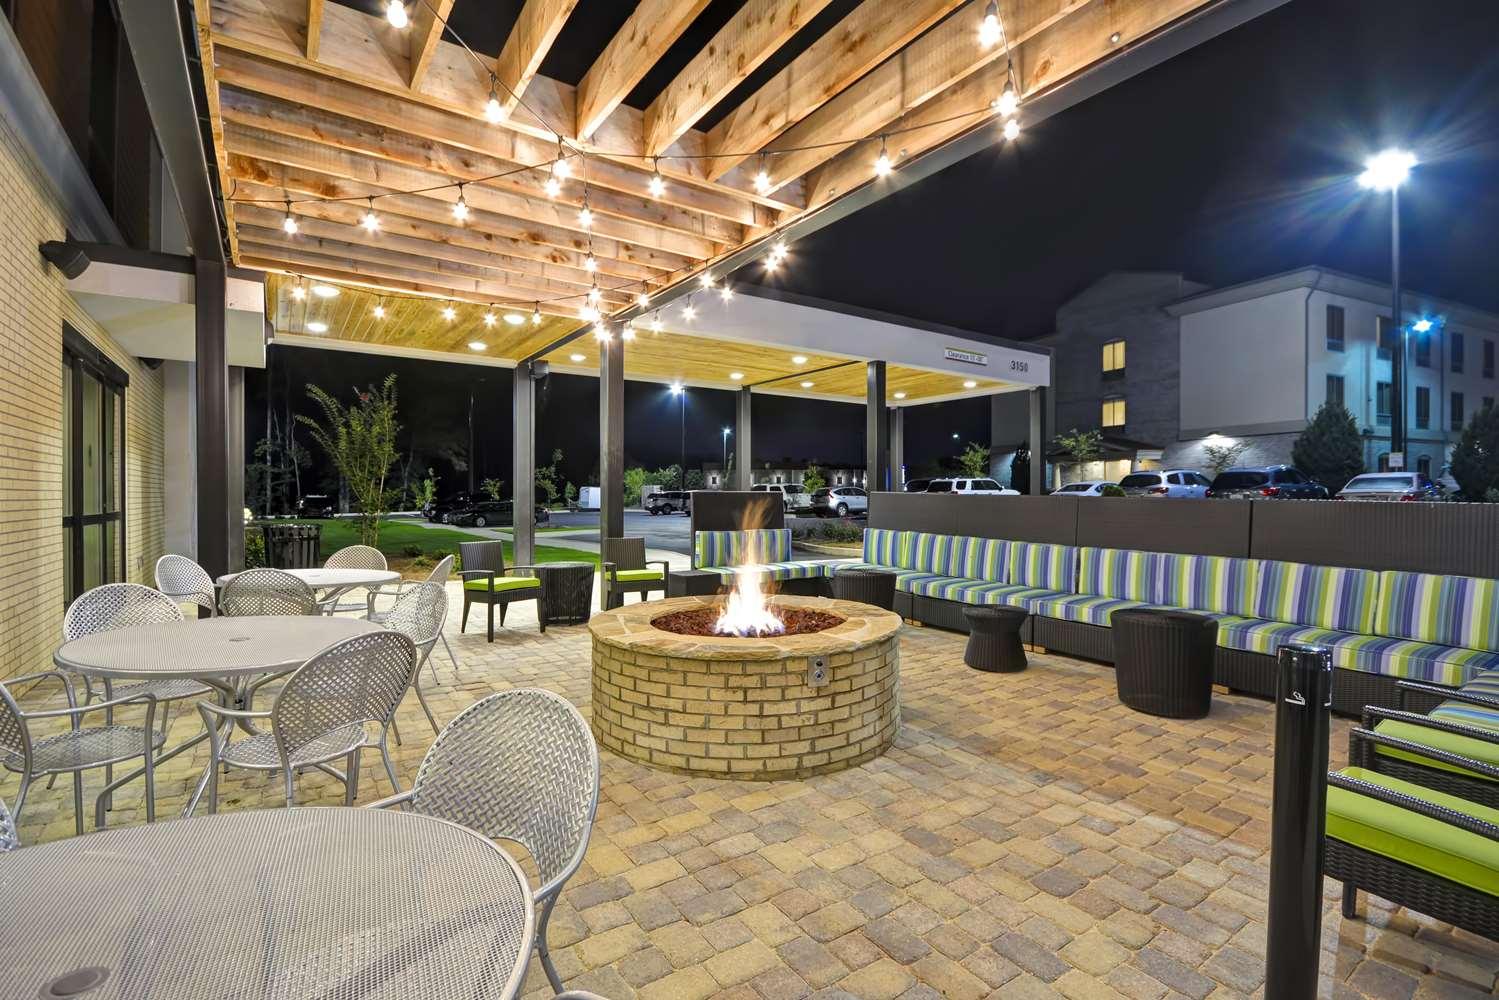 Home2 Suites by Hilton Opelika-Auburn, AL